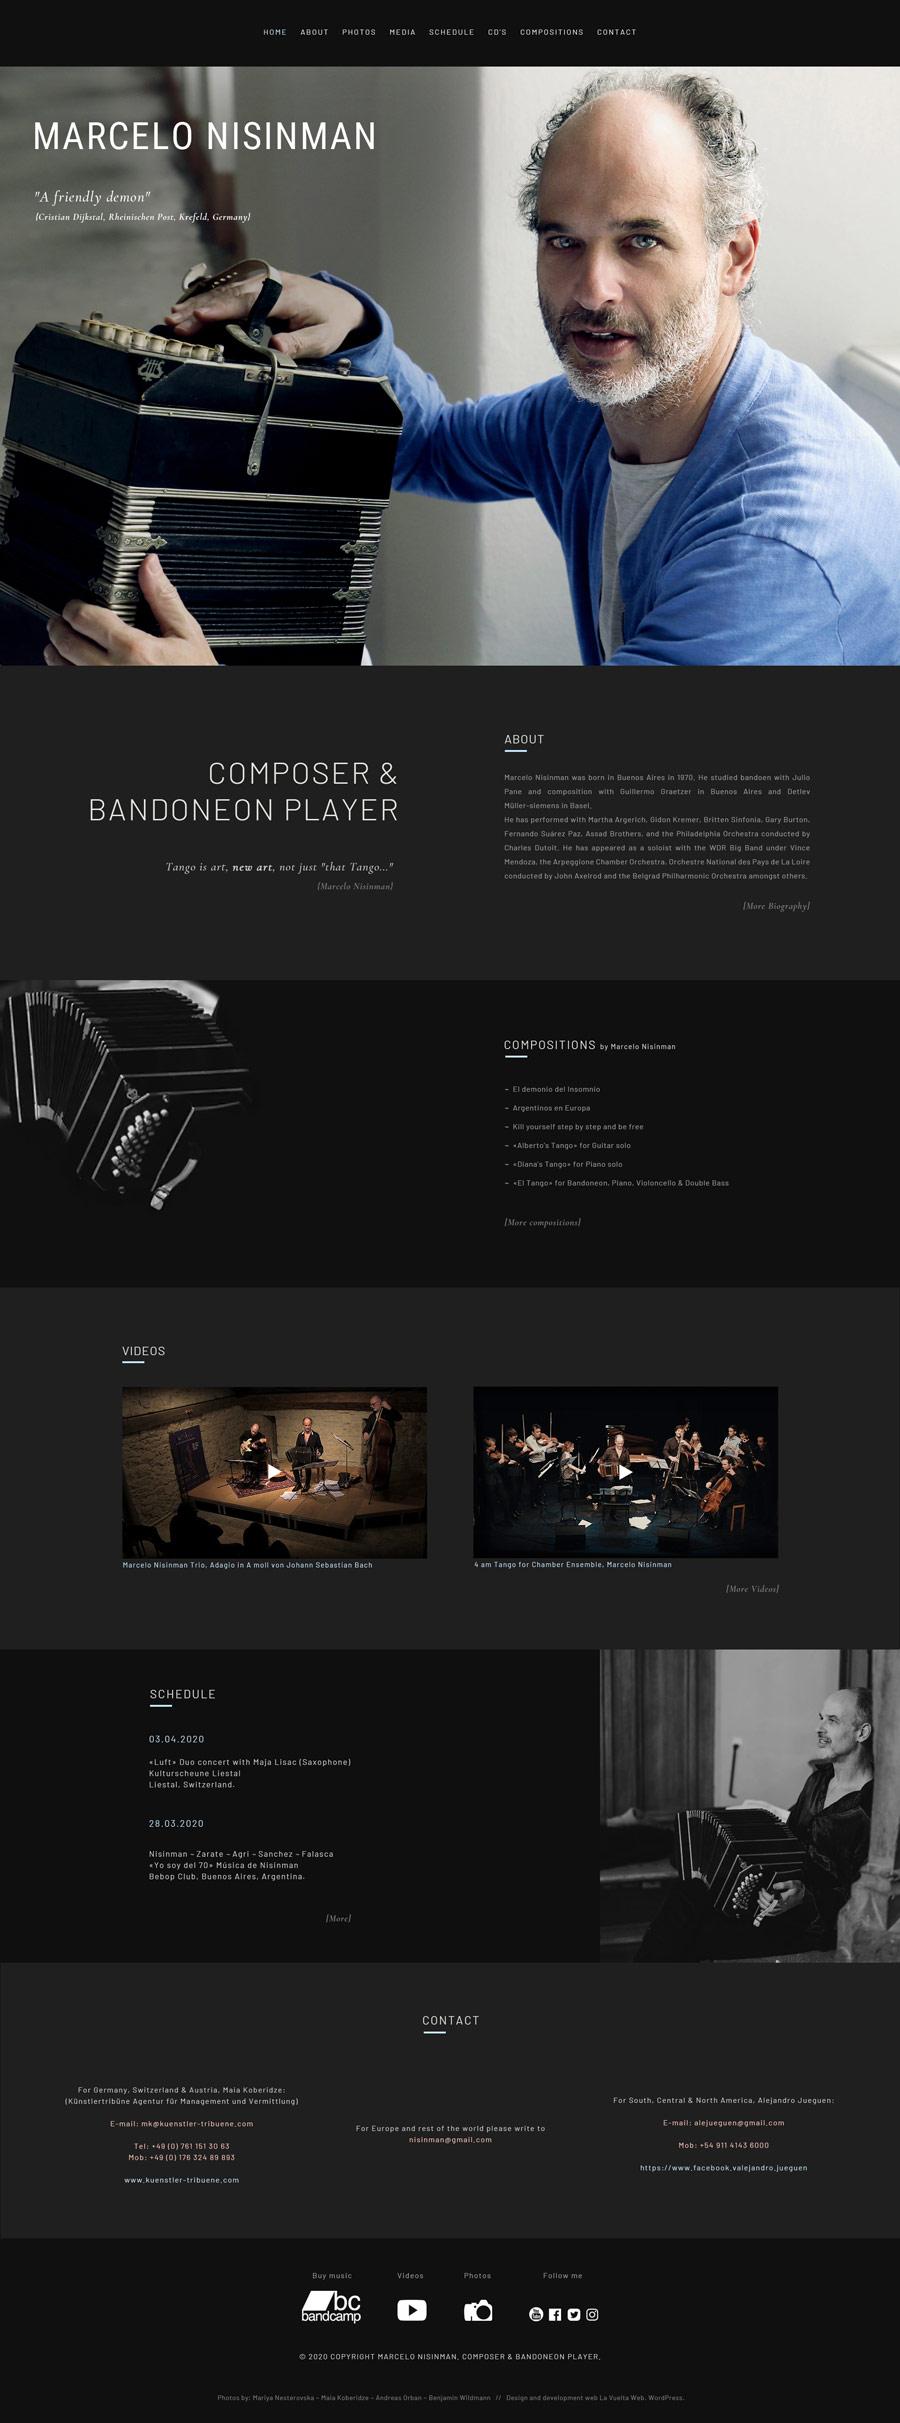 Portada website Marcelo Nisinman, composer & Bandoneón player, realizada por lavueltaweb.com